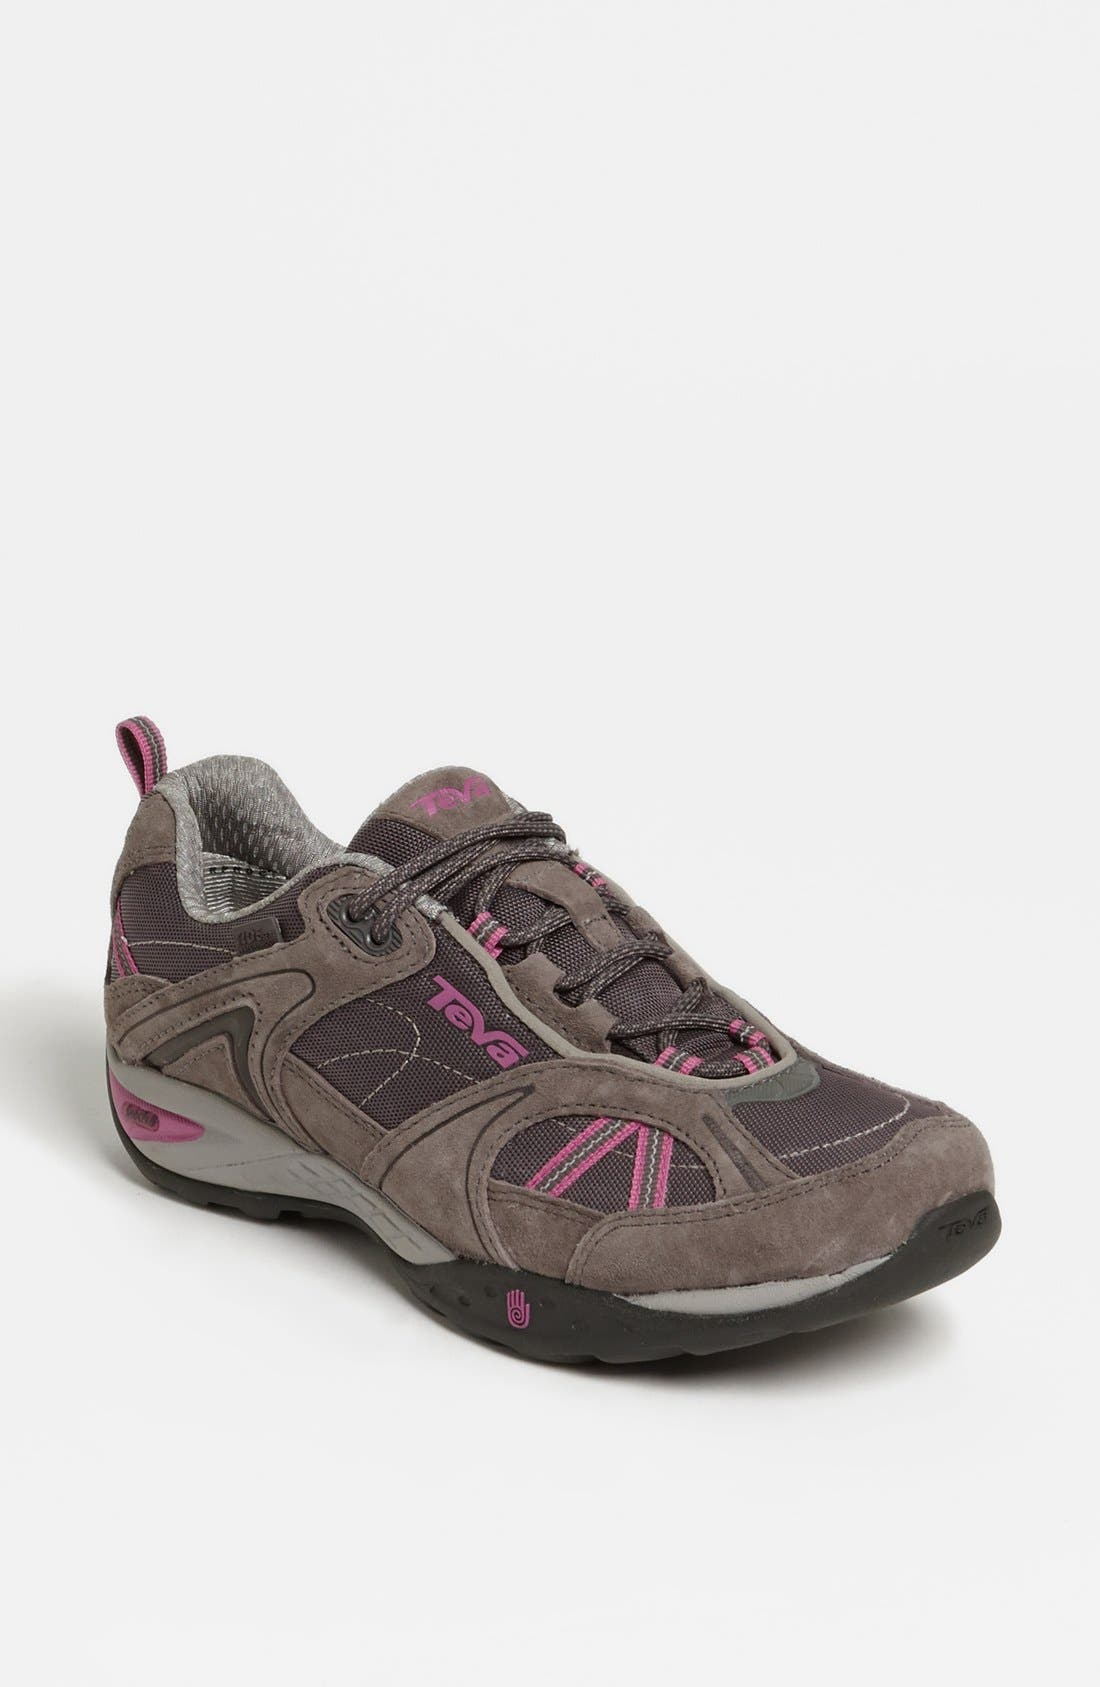 Alternate Image 1 Selected - Teva 'Sky Lake' Hiking Shoe (Women)